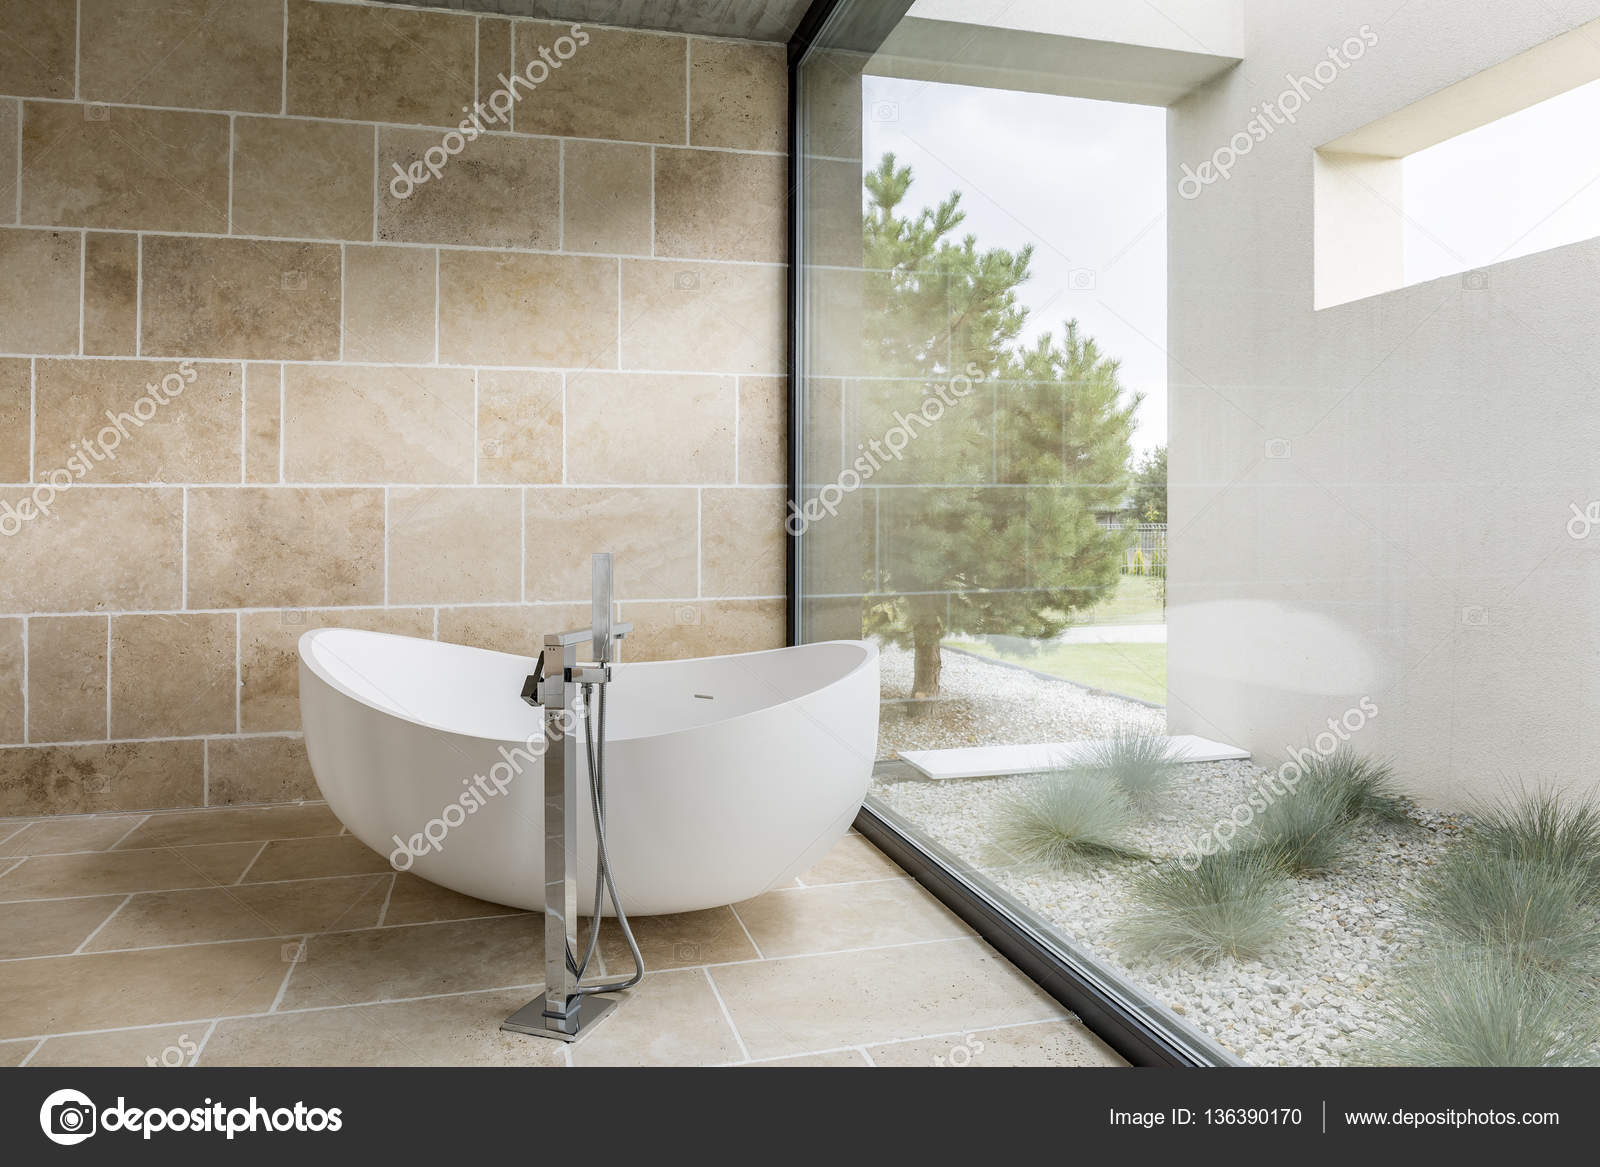 Badkamer met venster muur — Stockfoto © photographee.eu #136390170